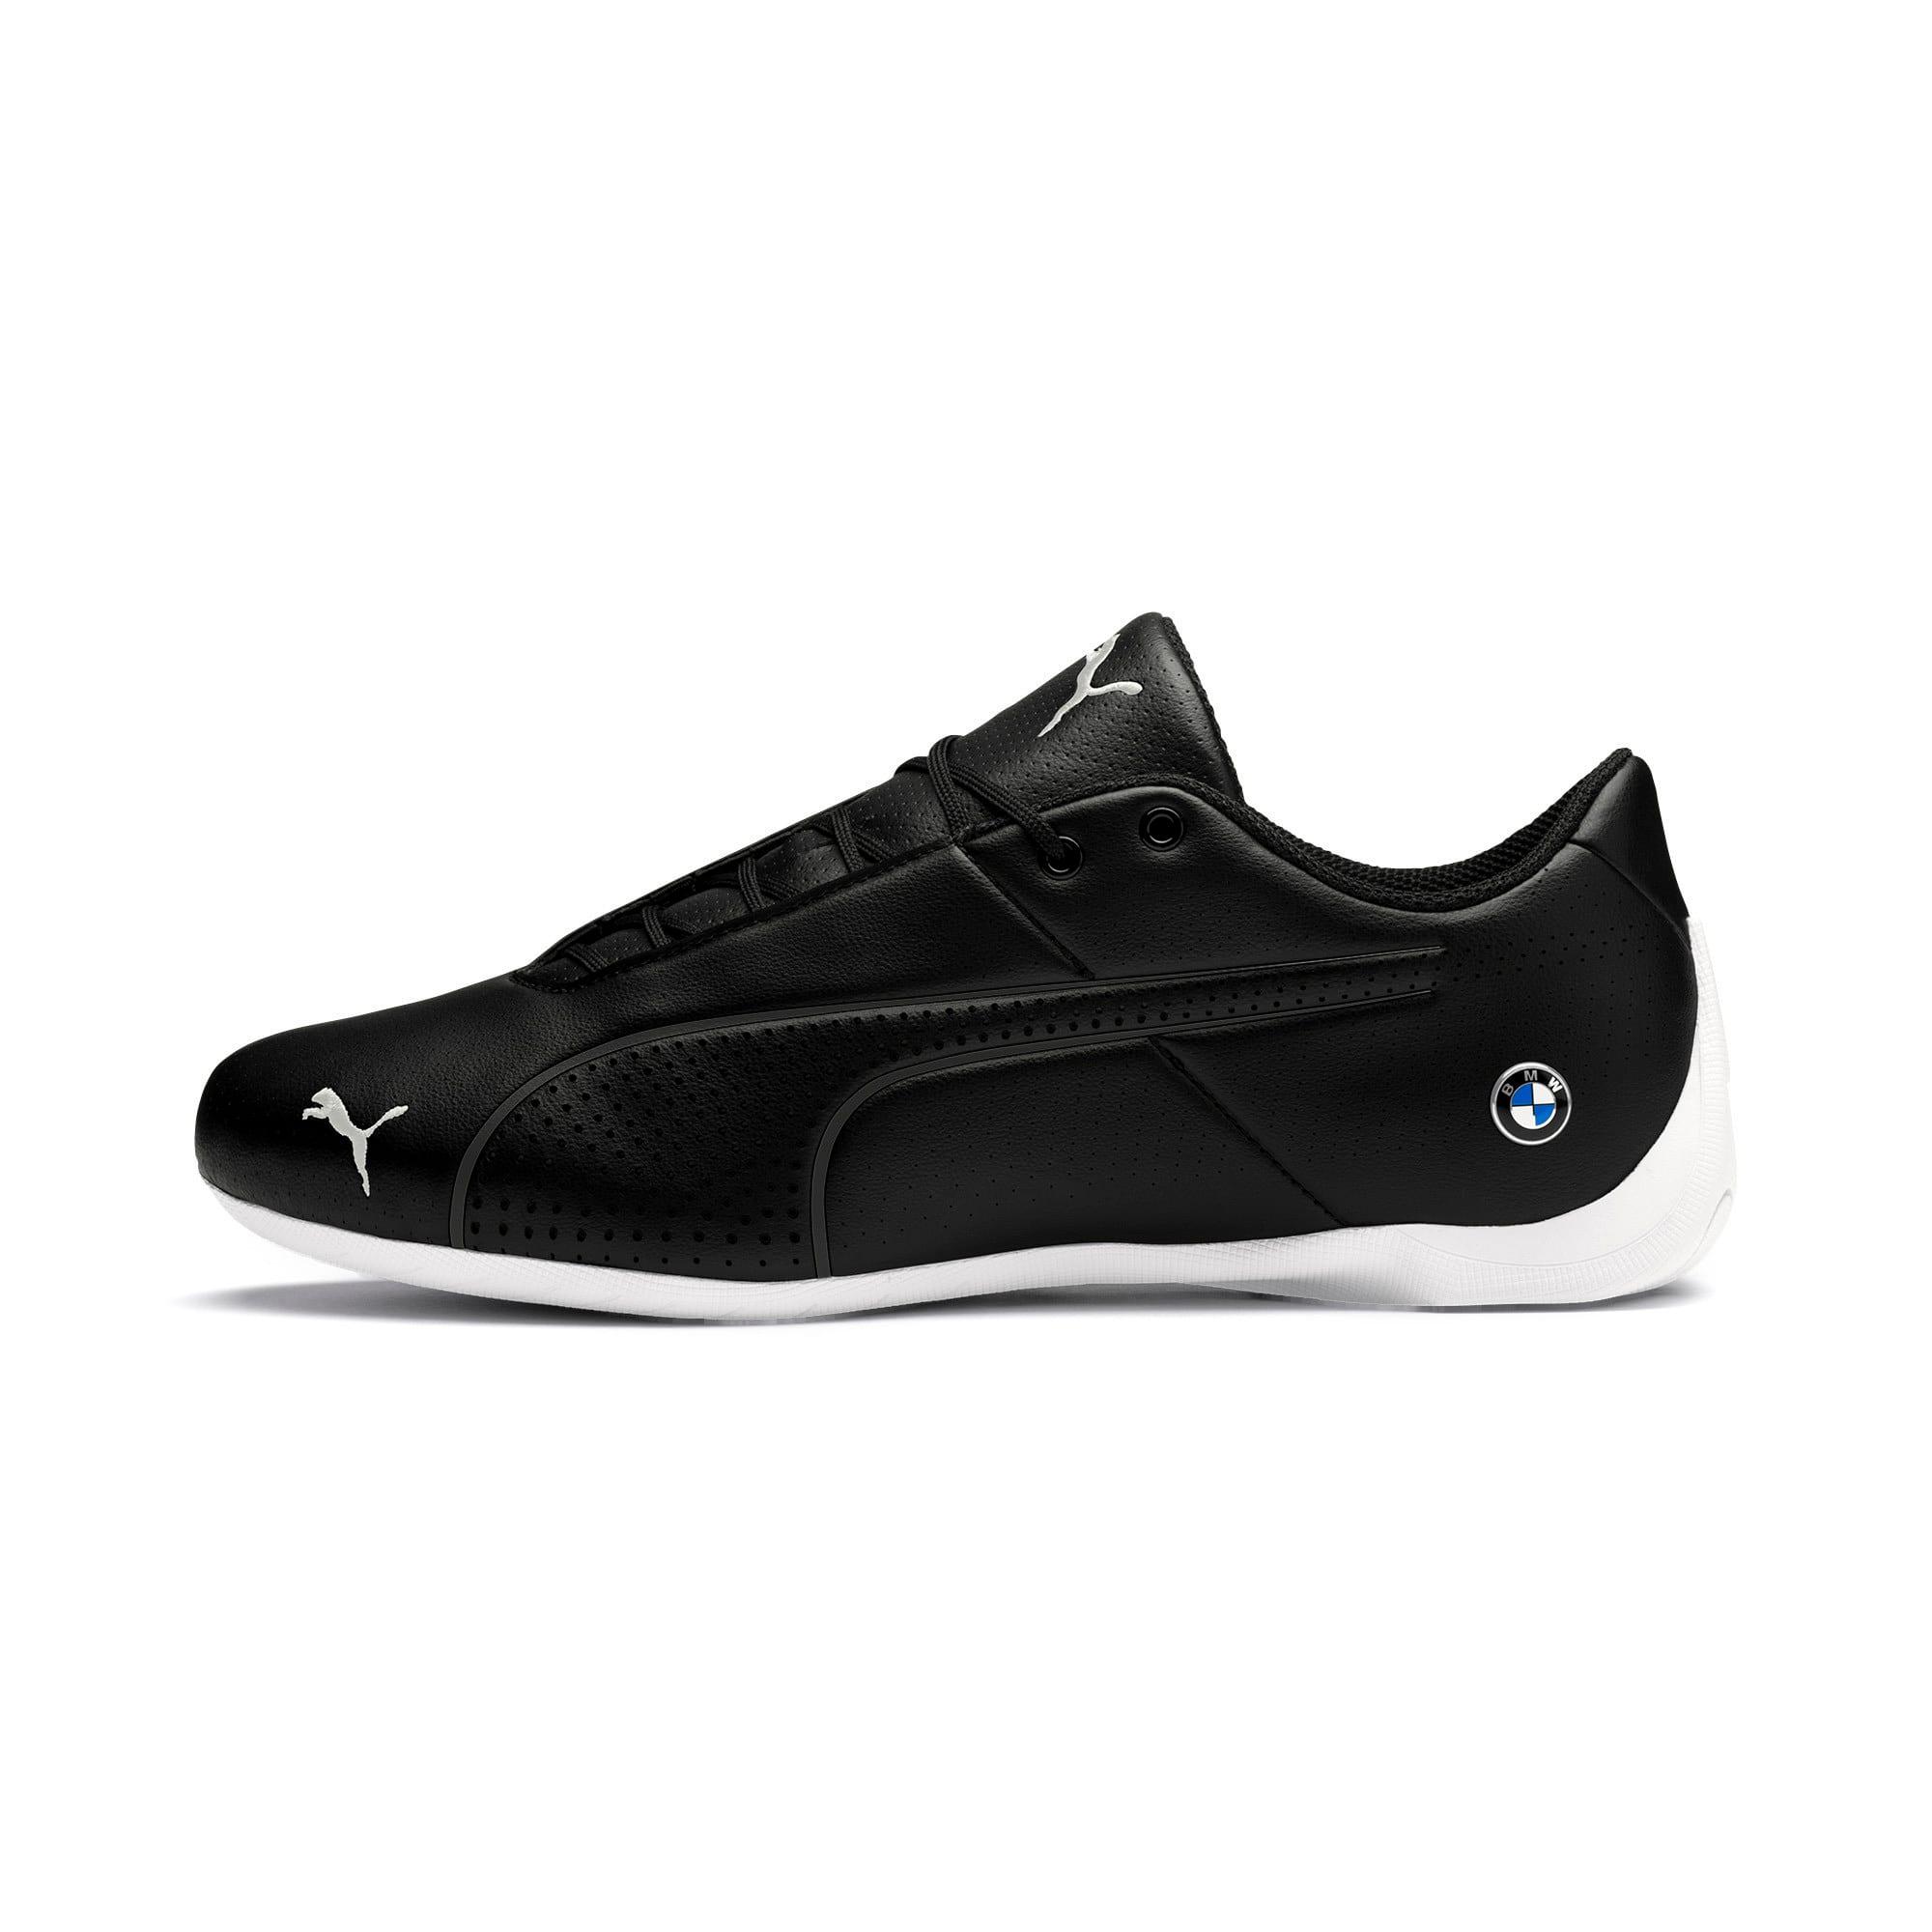 Thumbnail 1 of BMW Motorsport Future Cat Ultra sneakers, Black-White-Gray Violet, medium